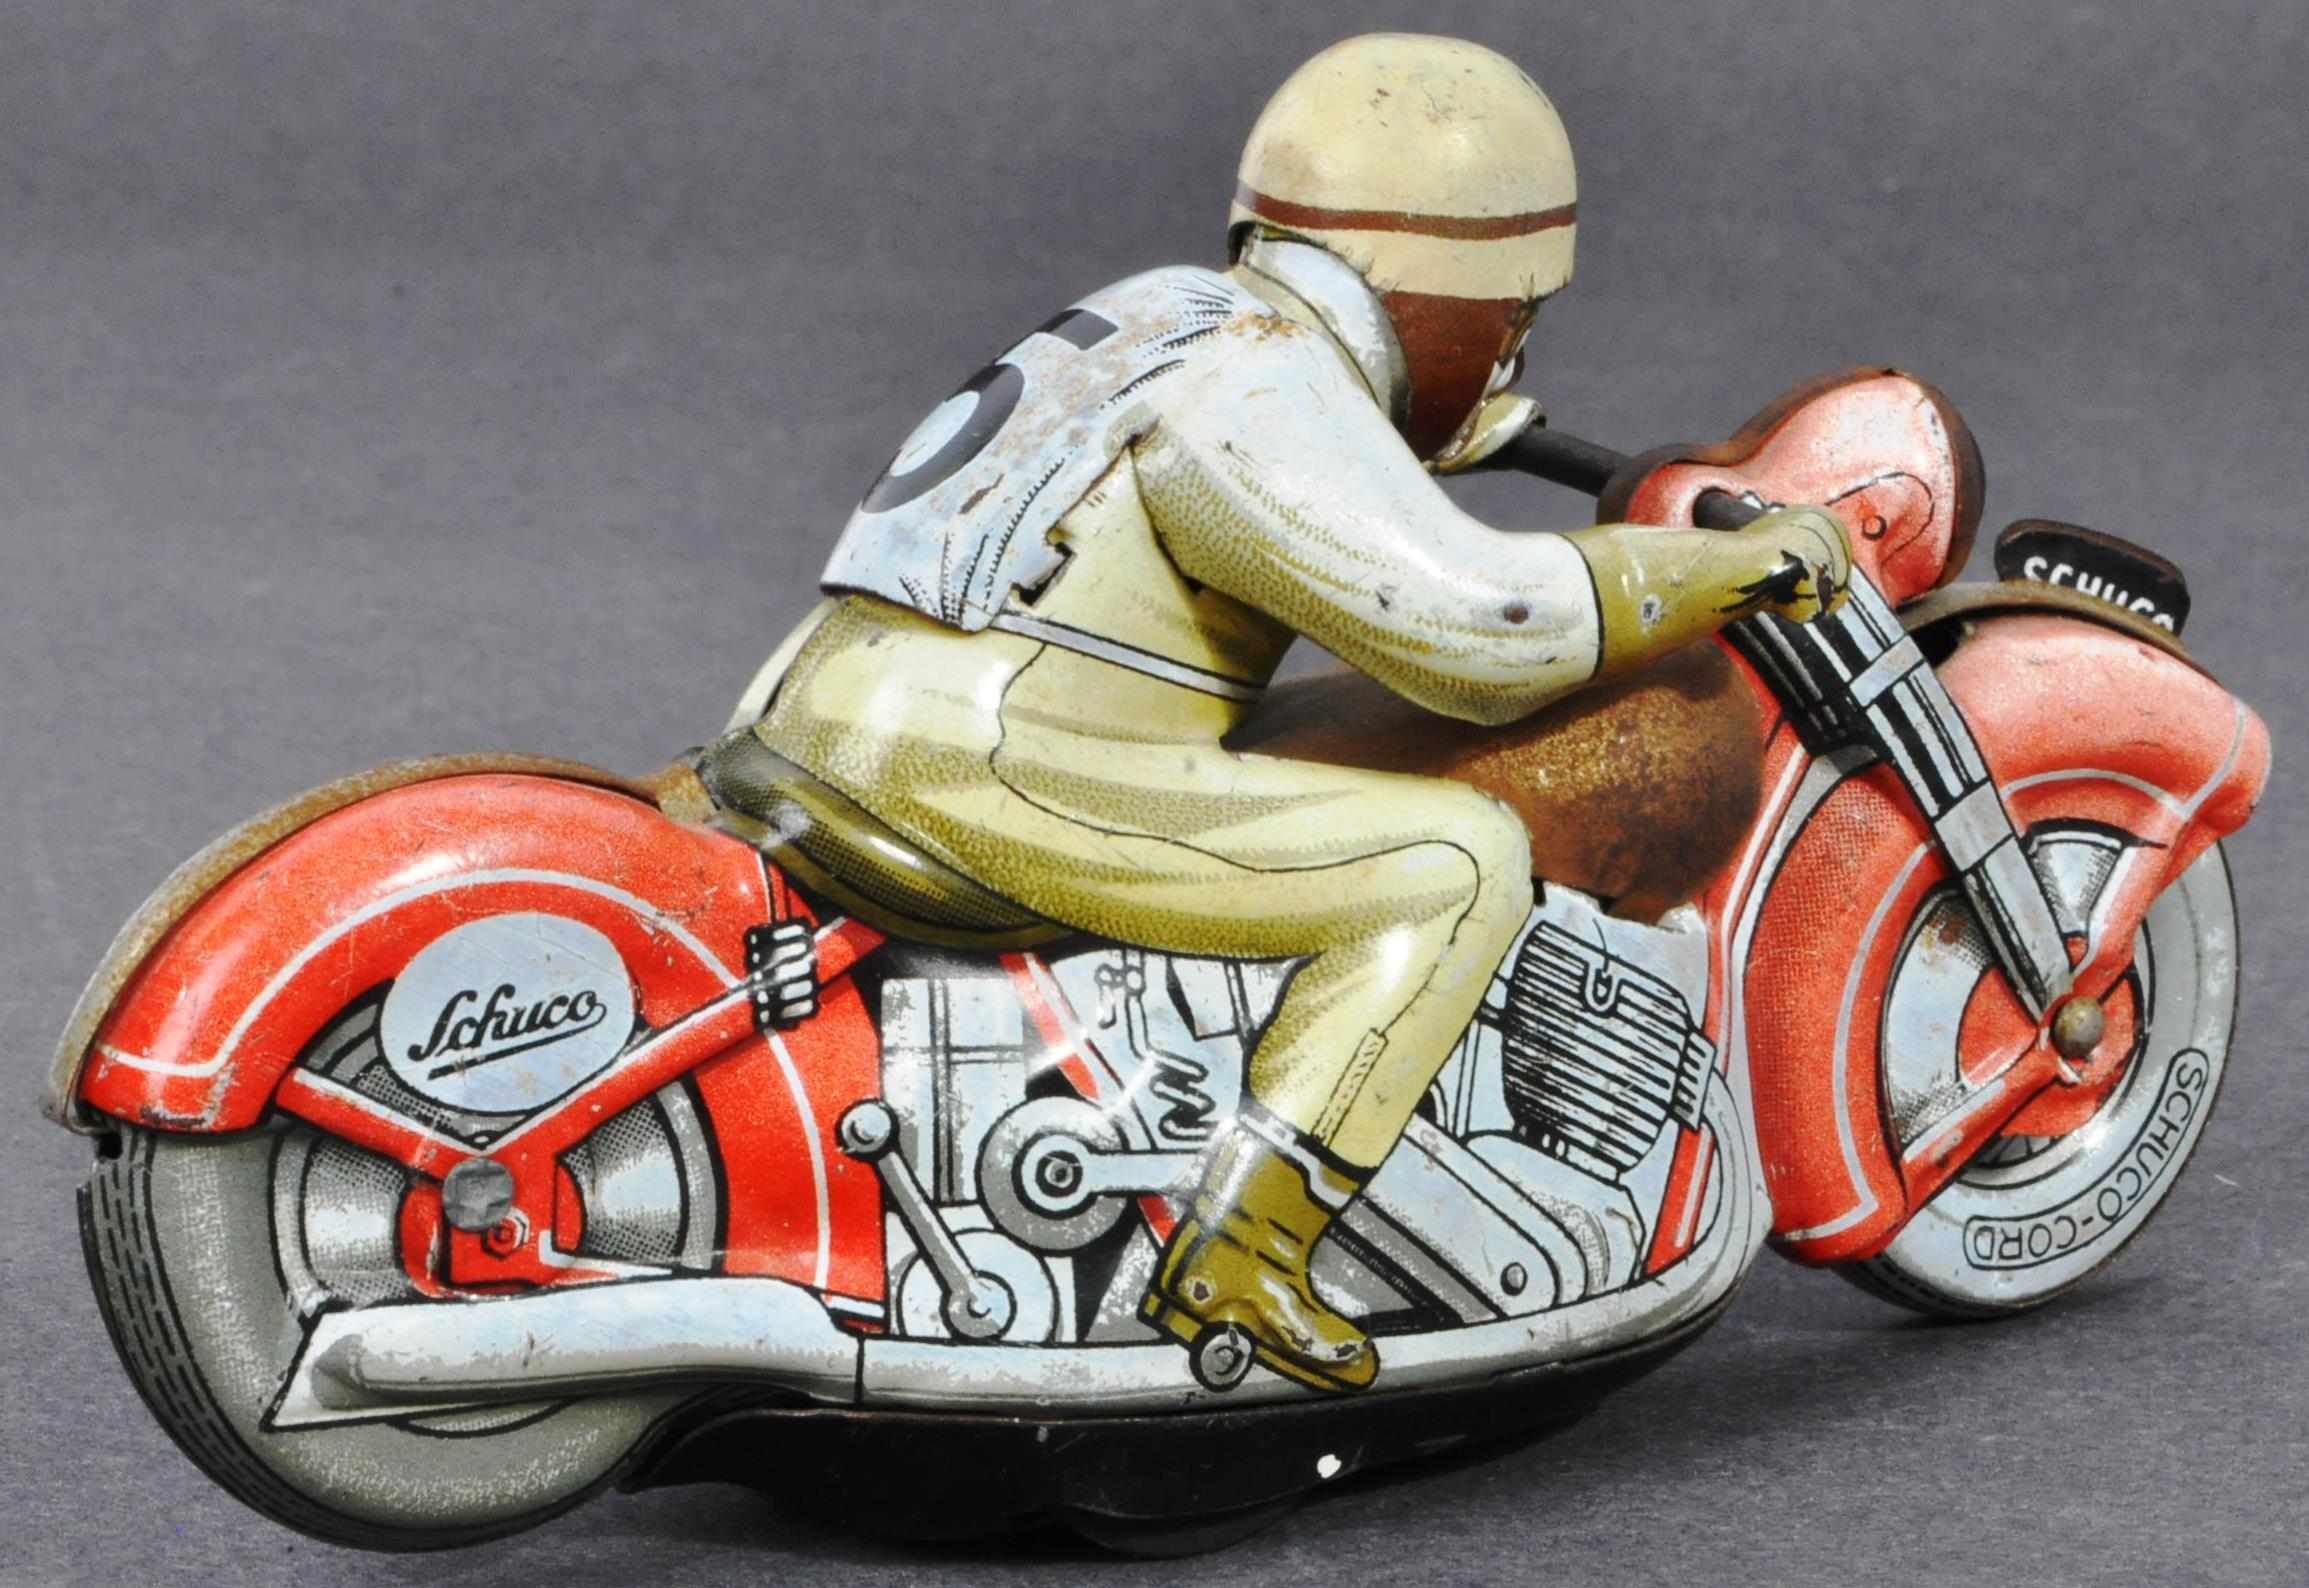 ORIGINAL VINTAGE SCHUCO TINPLATE RACING MOTORCYCLE - Image 2 of 8